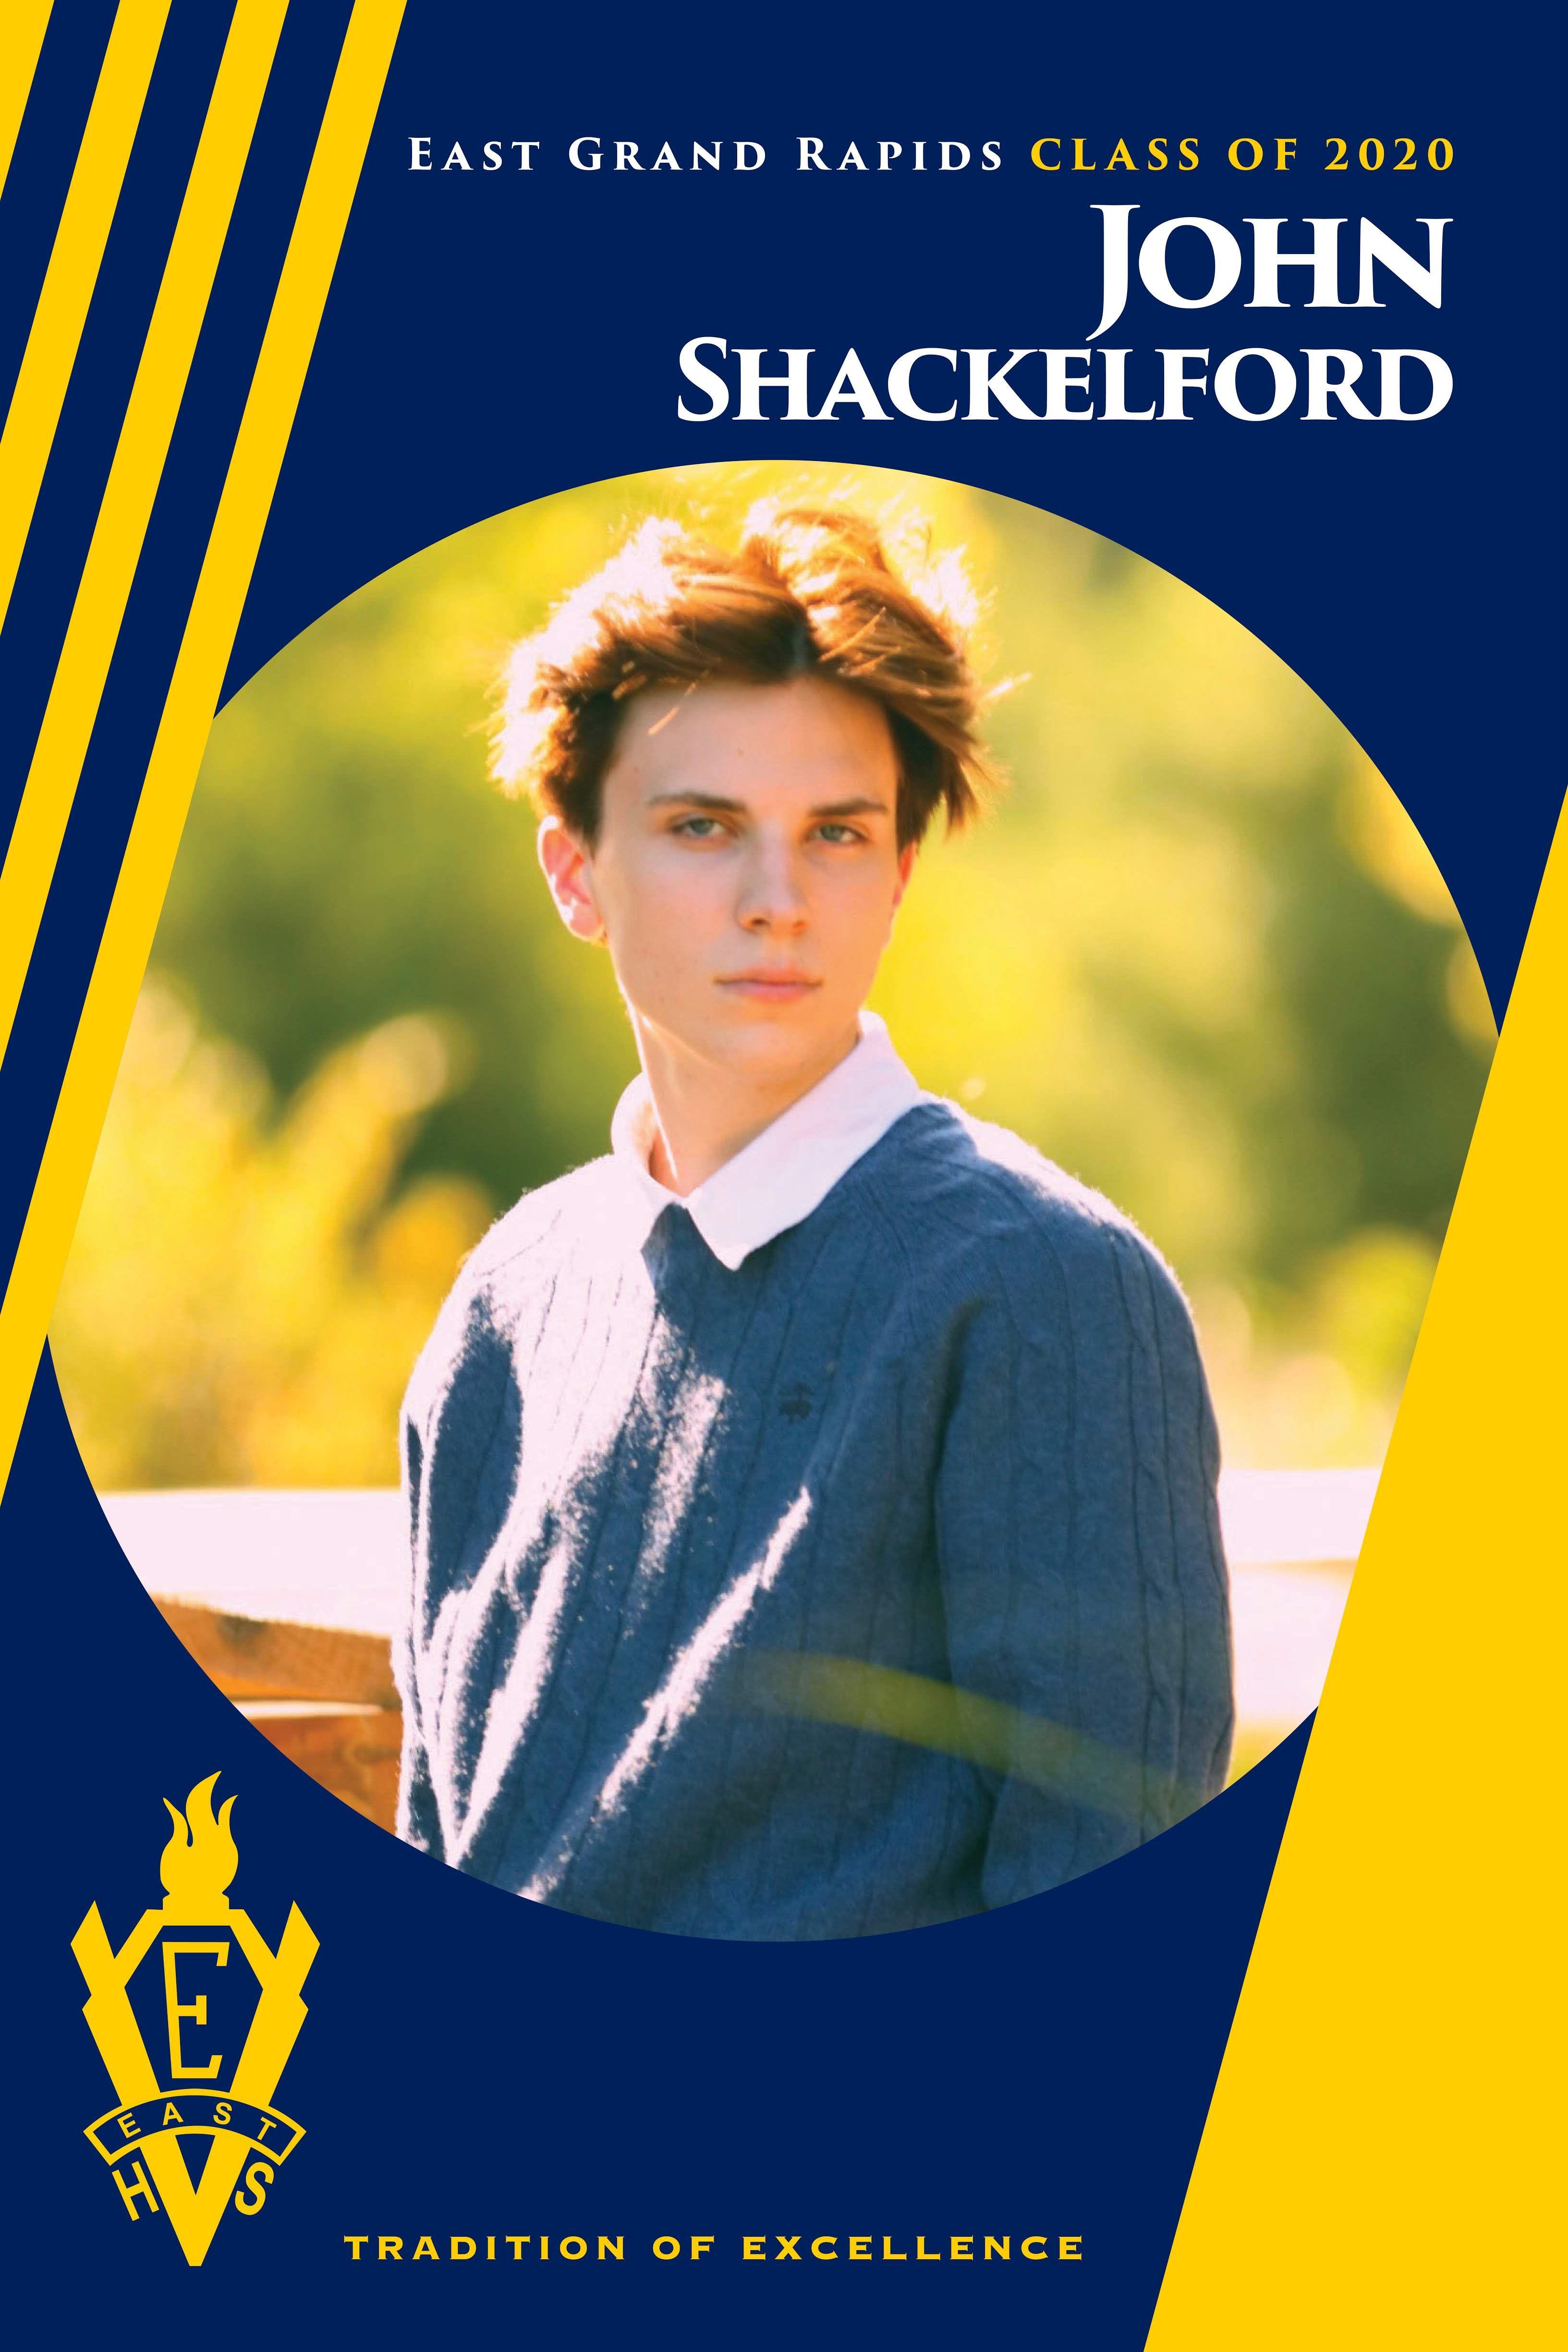 John Shackelford